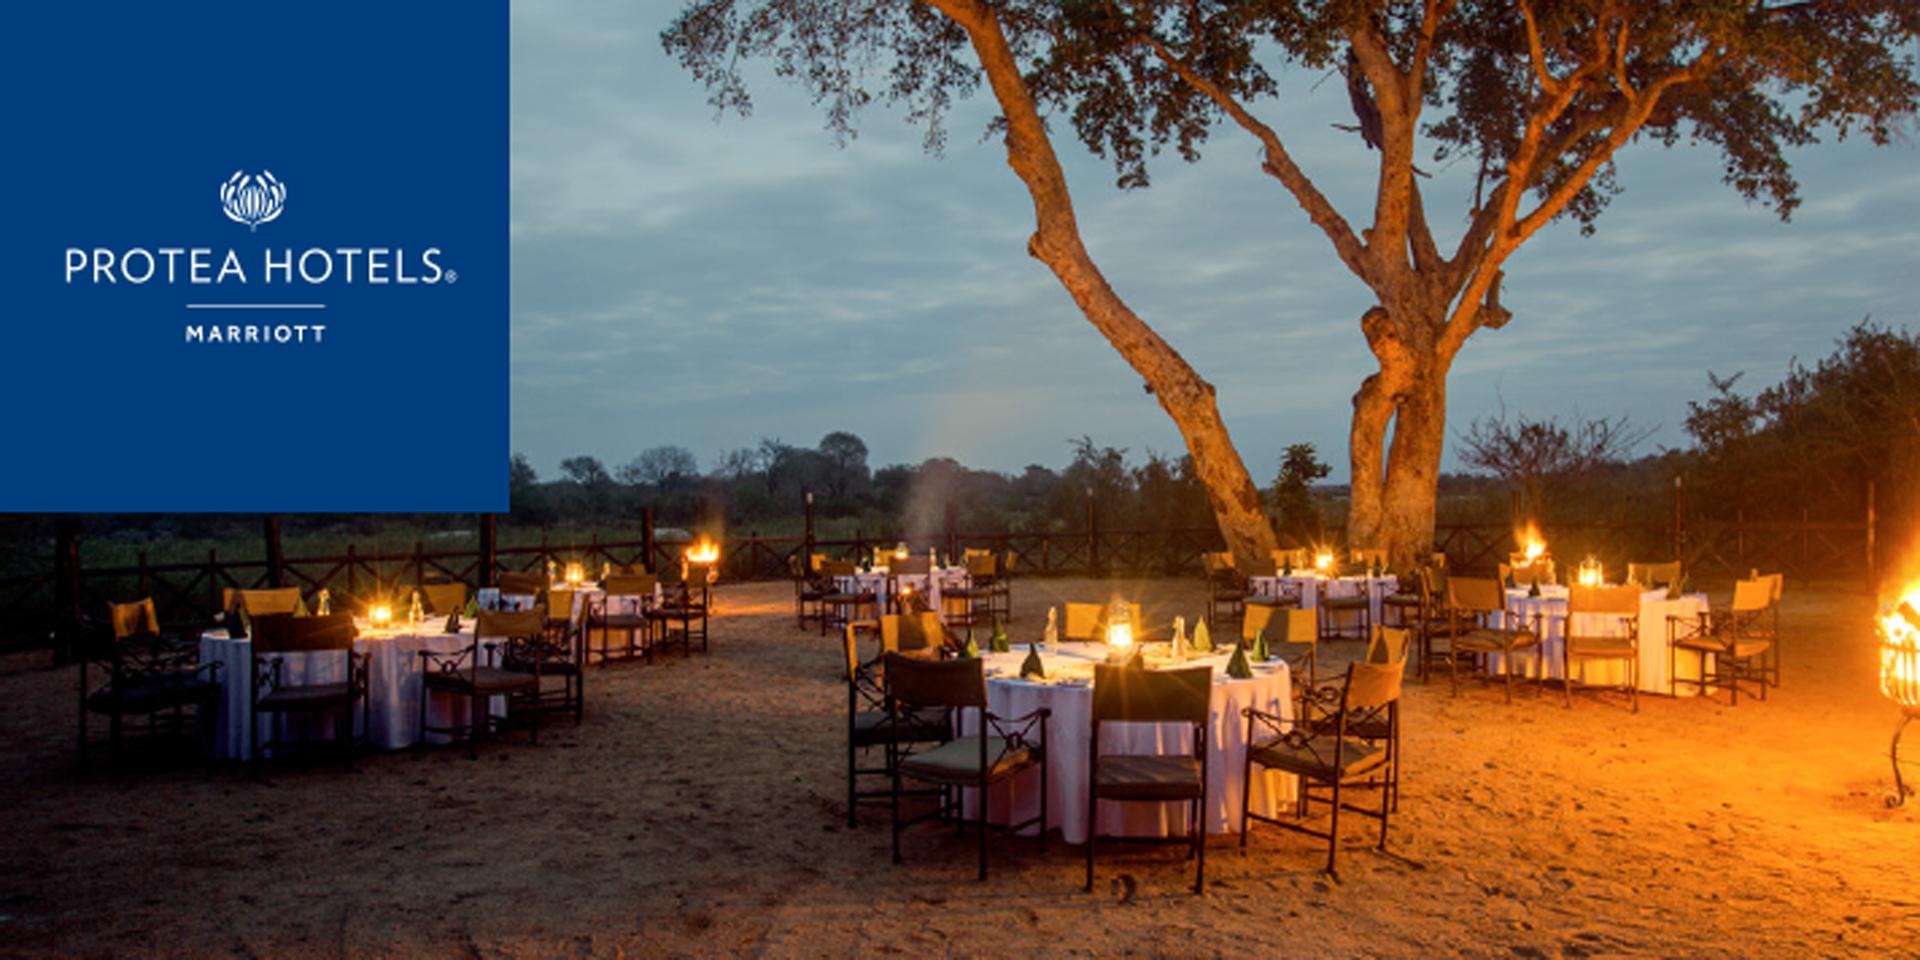 Marriott International rebrands Protea Hotels in Africa — Protea Hotels by Marriott®